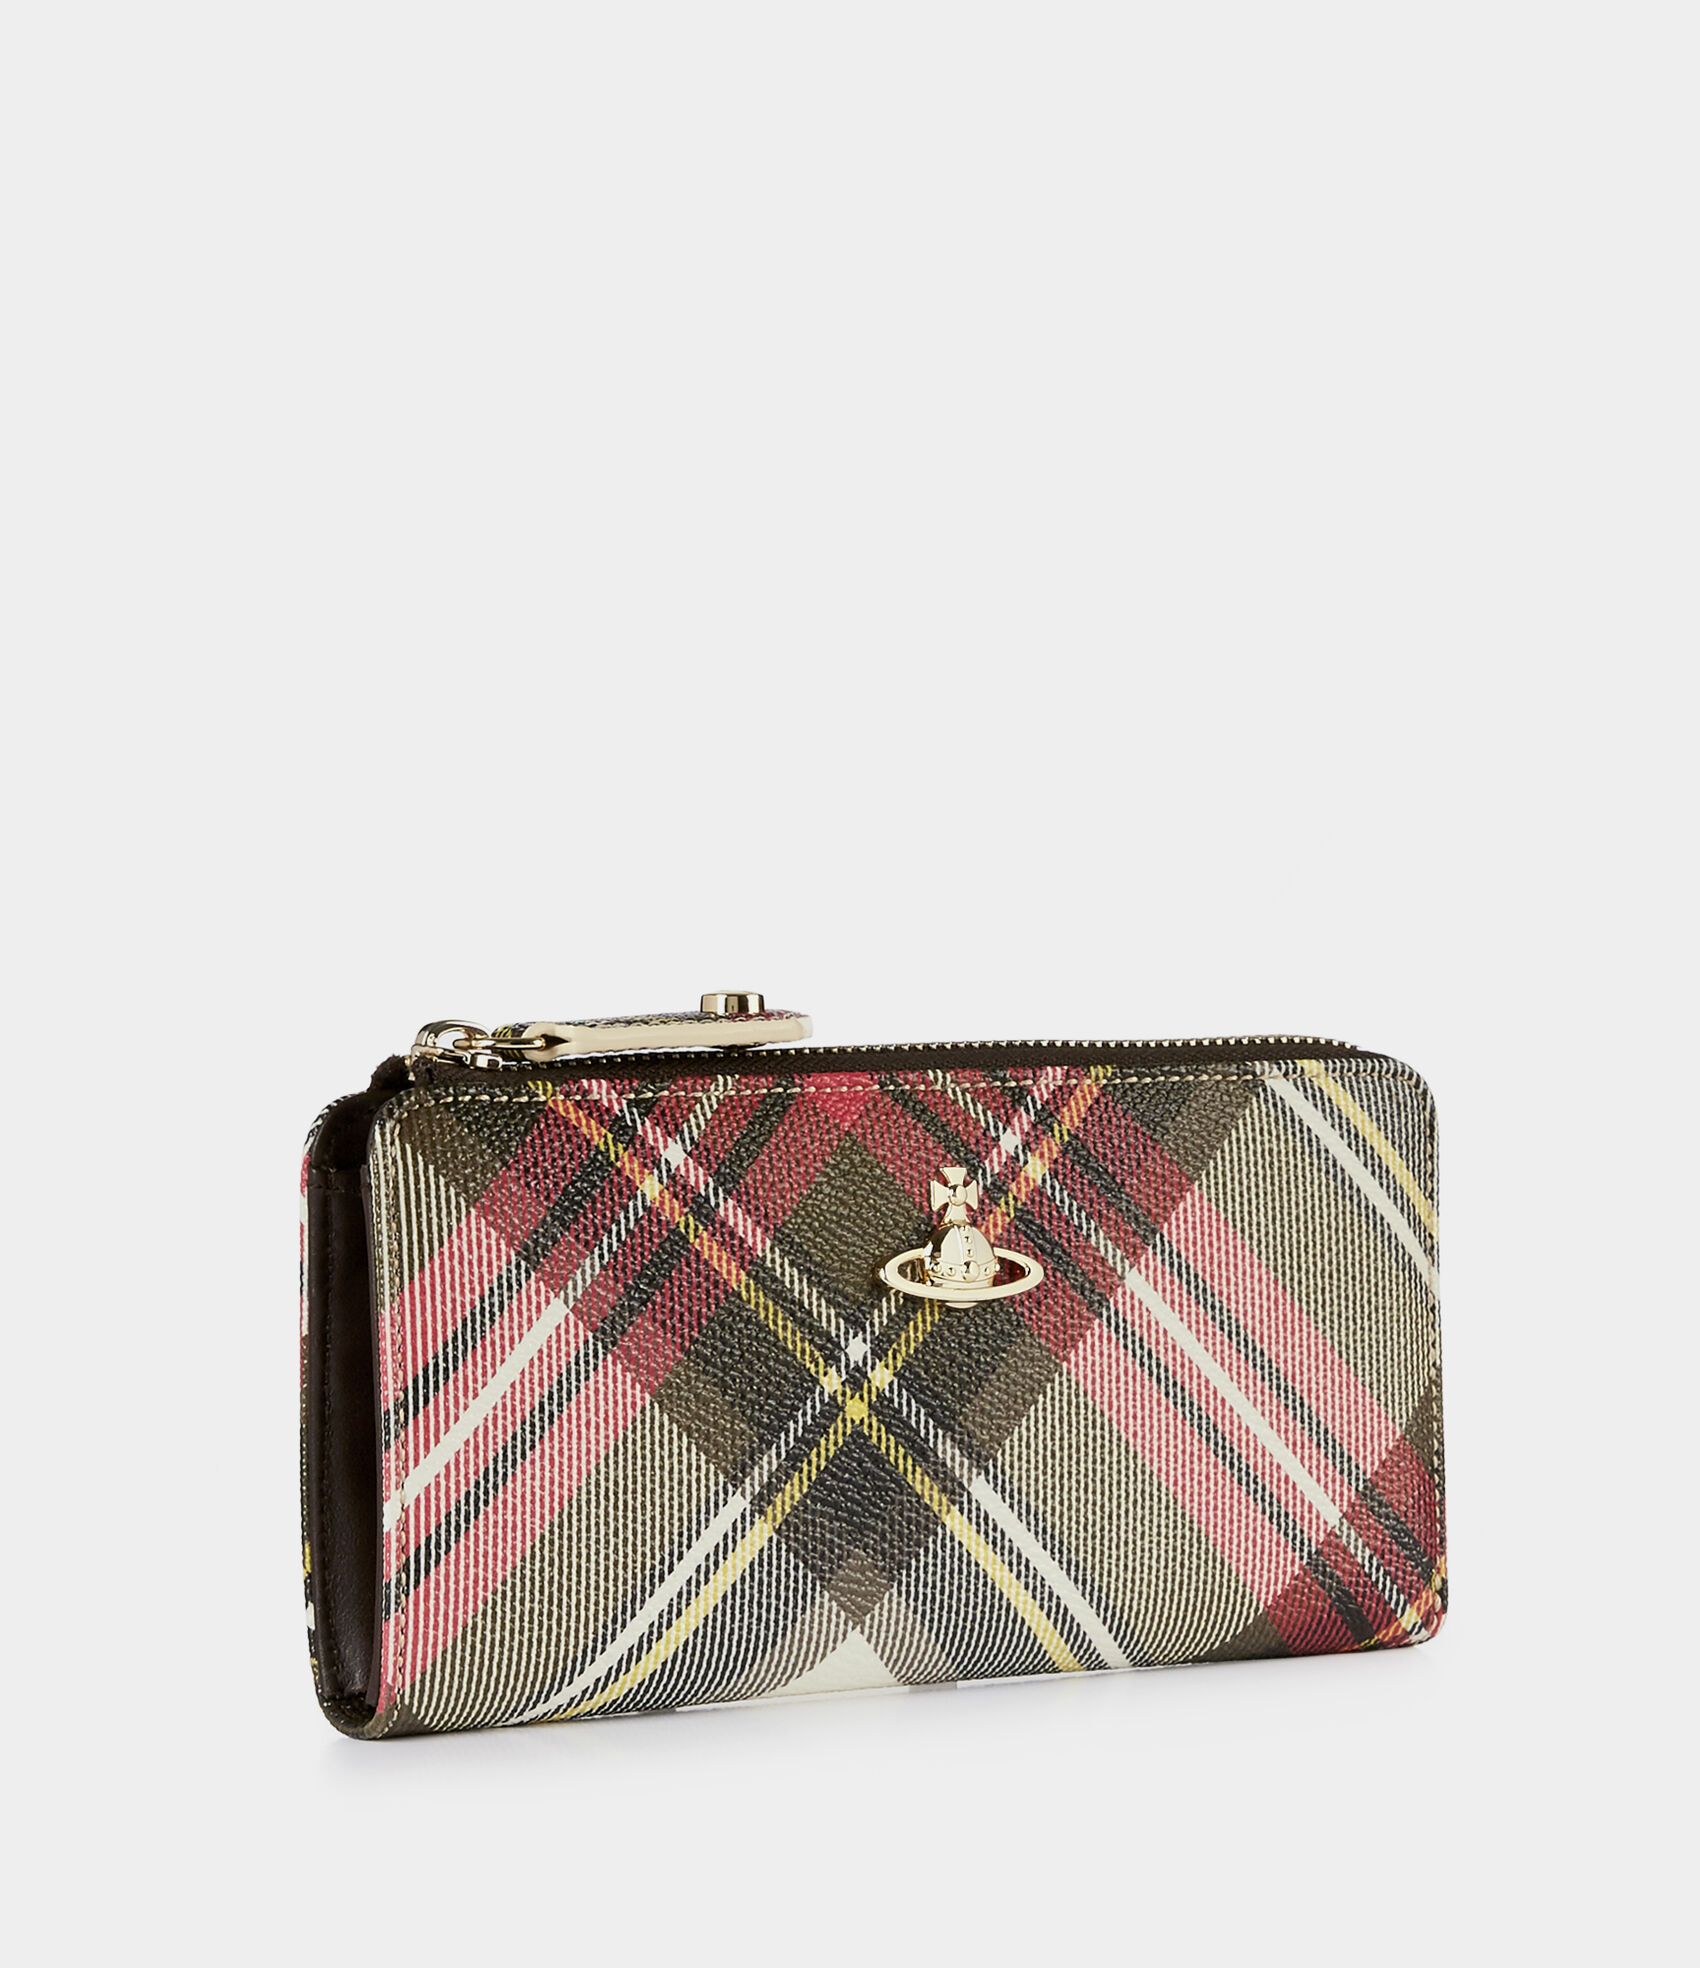 0972705de0 Vivienne Westwood Women's Designer Wallets and Purses | Vivienne Westwood -  DERBY ZIP WALLET